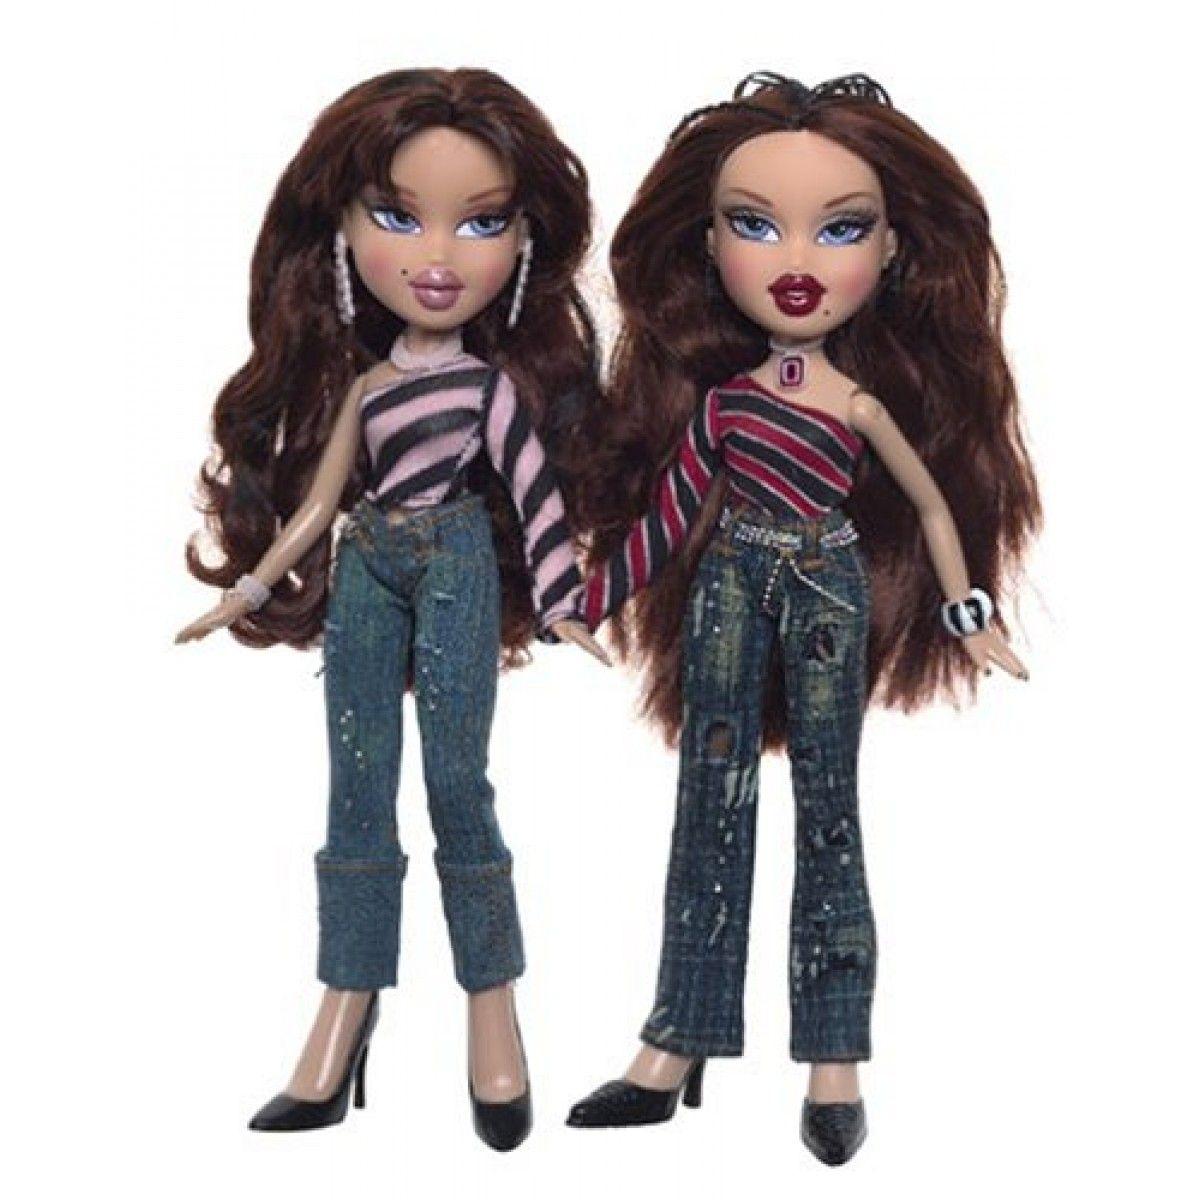 bratz twins dolls bratz twins ideas for the house